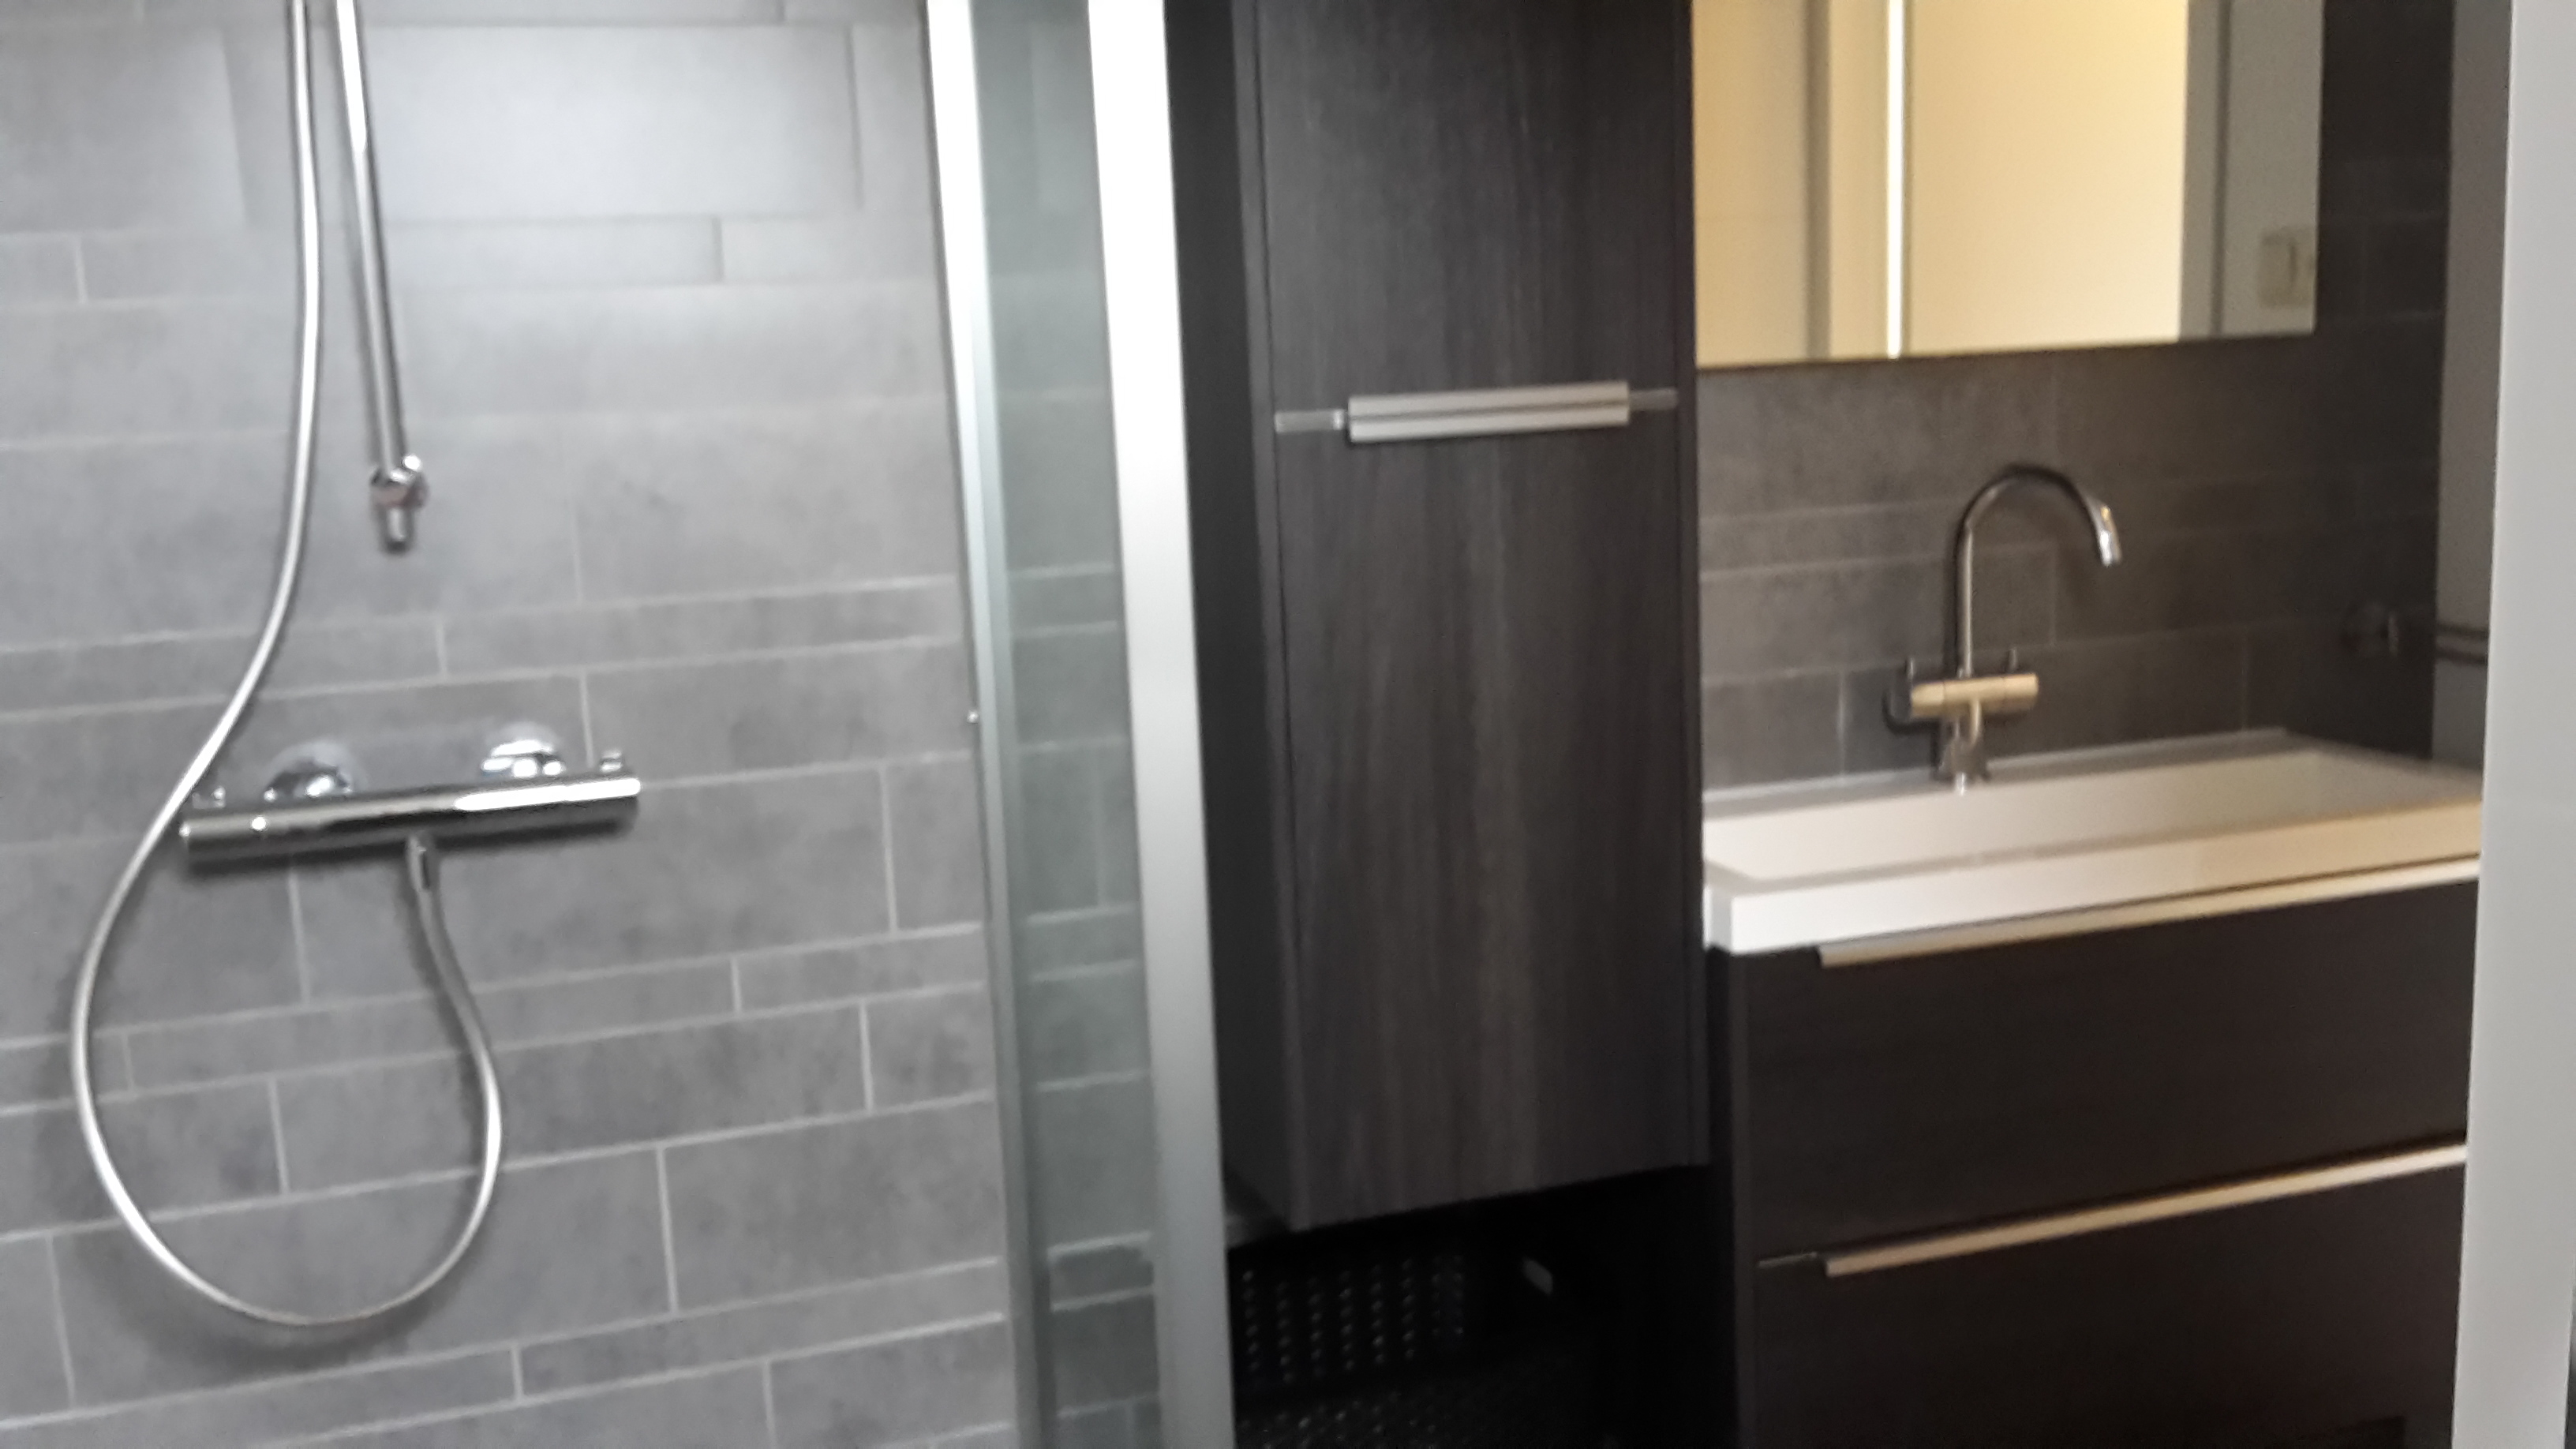 Wildverband Tegels Badkamer : Badkamer leek t riemersma bouw onderhoud